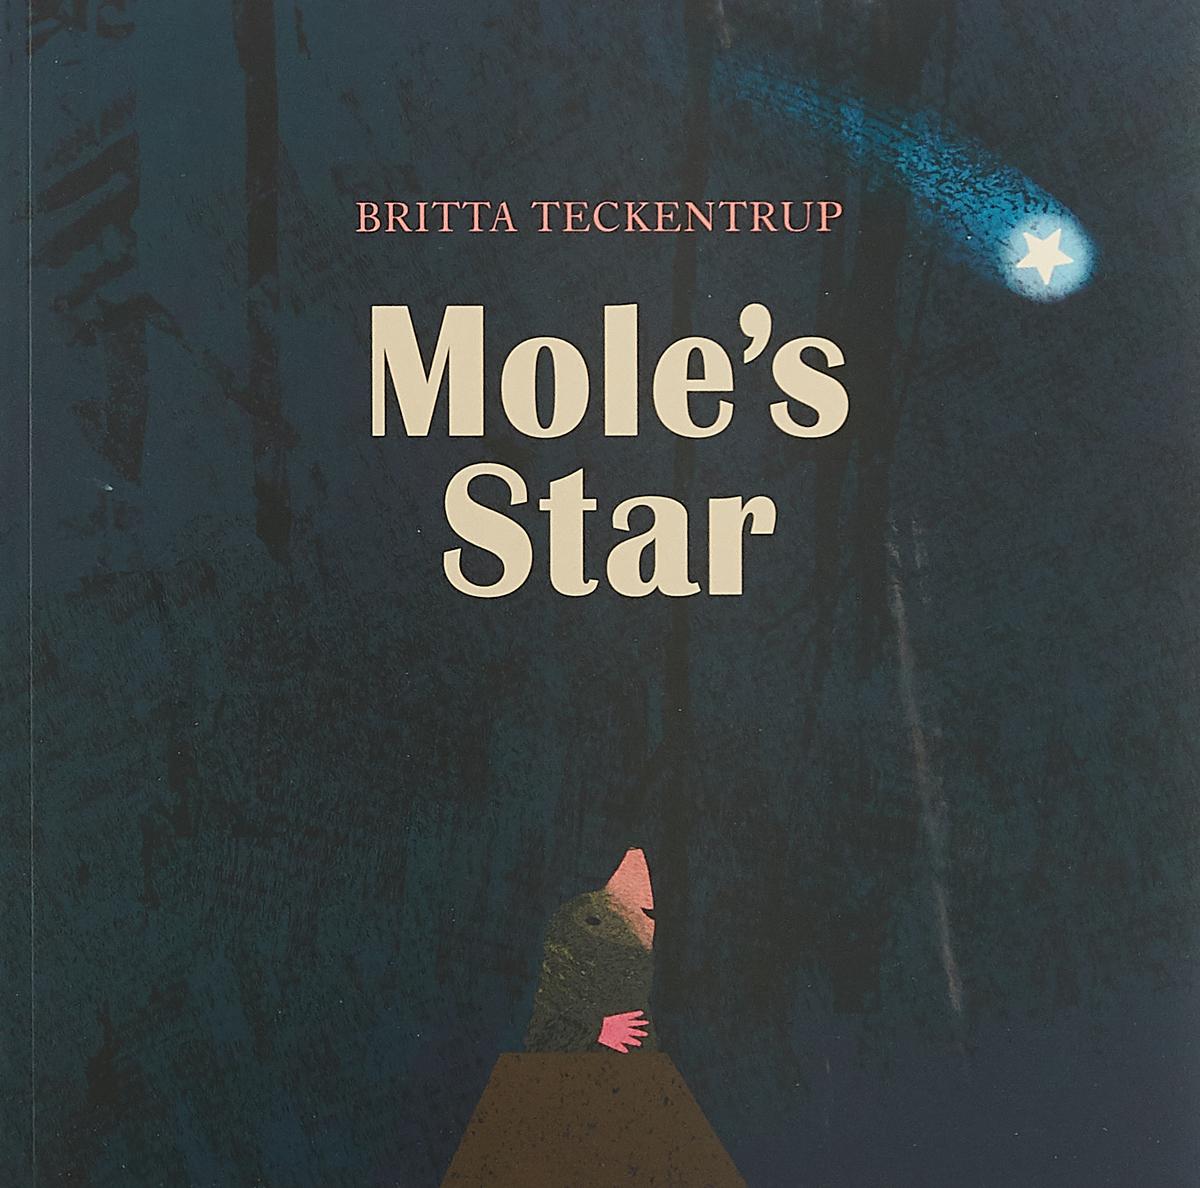 Mole's Star e nevin stars of the summer night